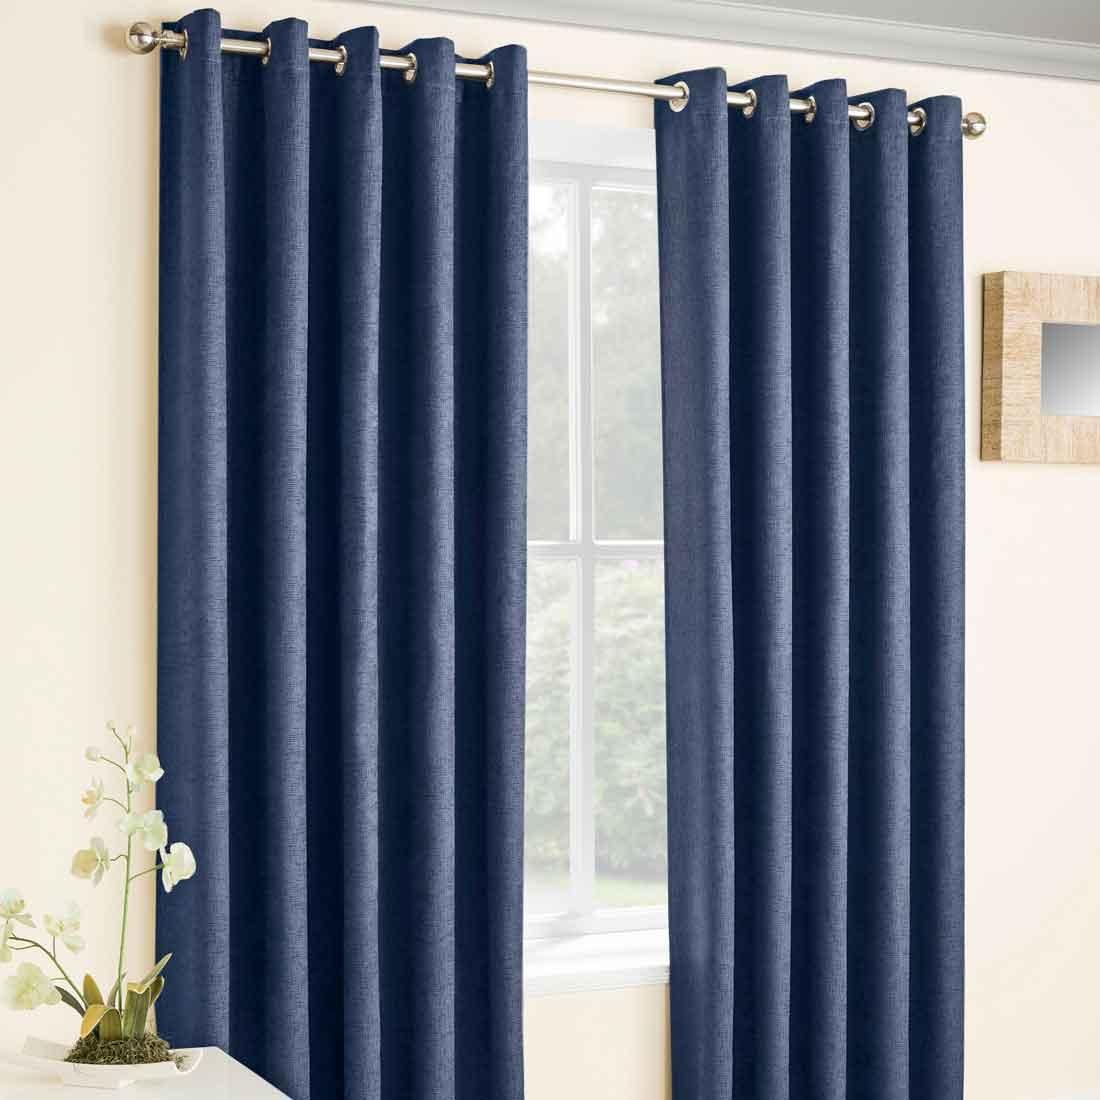 Vogue Navy Eyelet Curtains